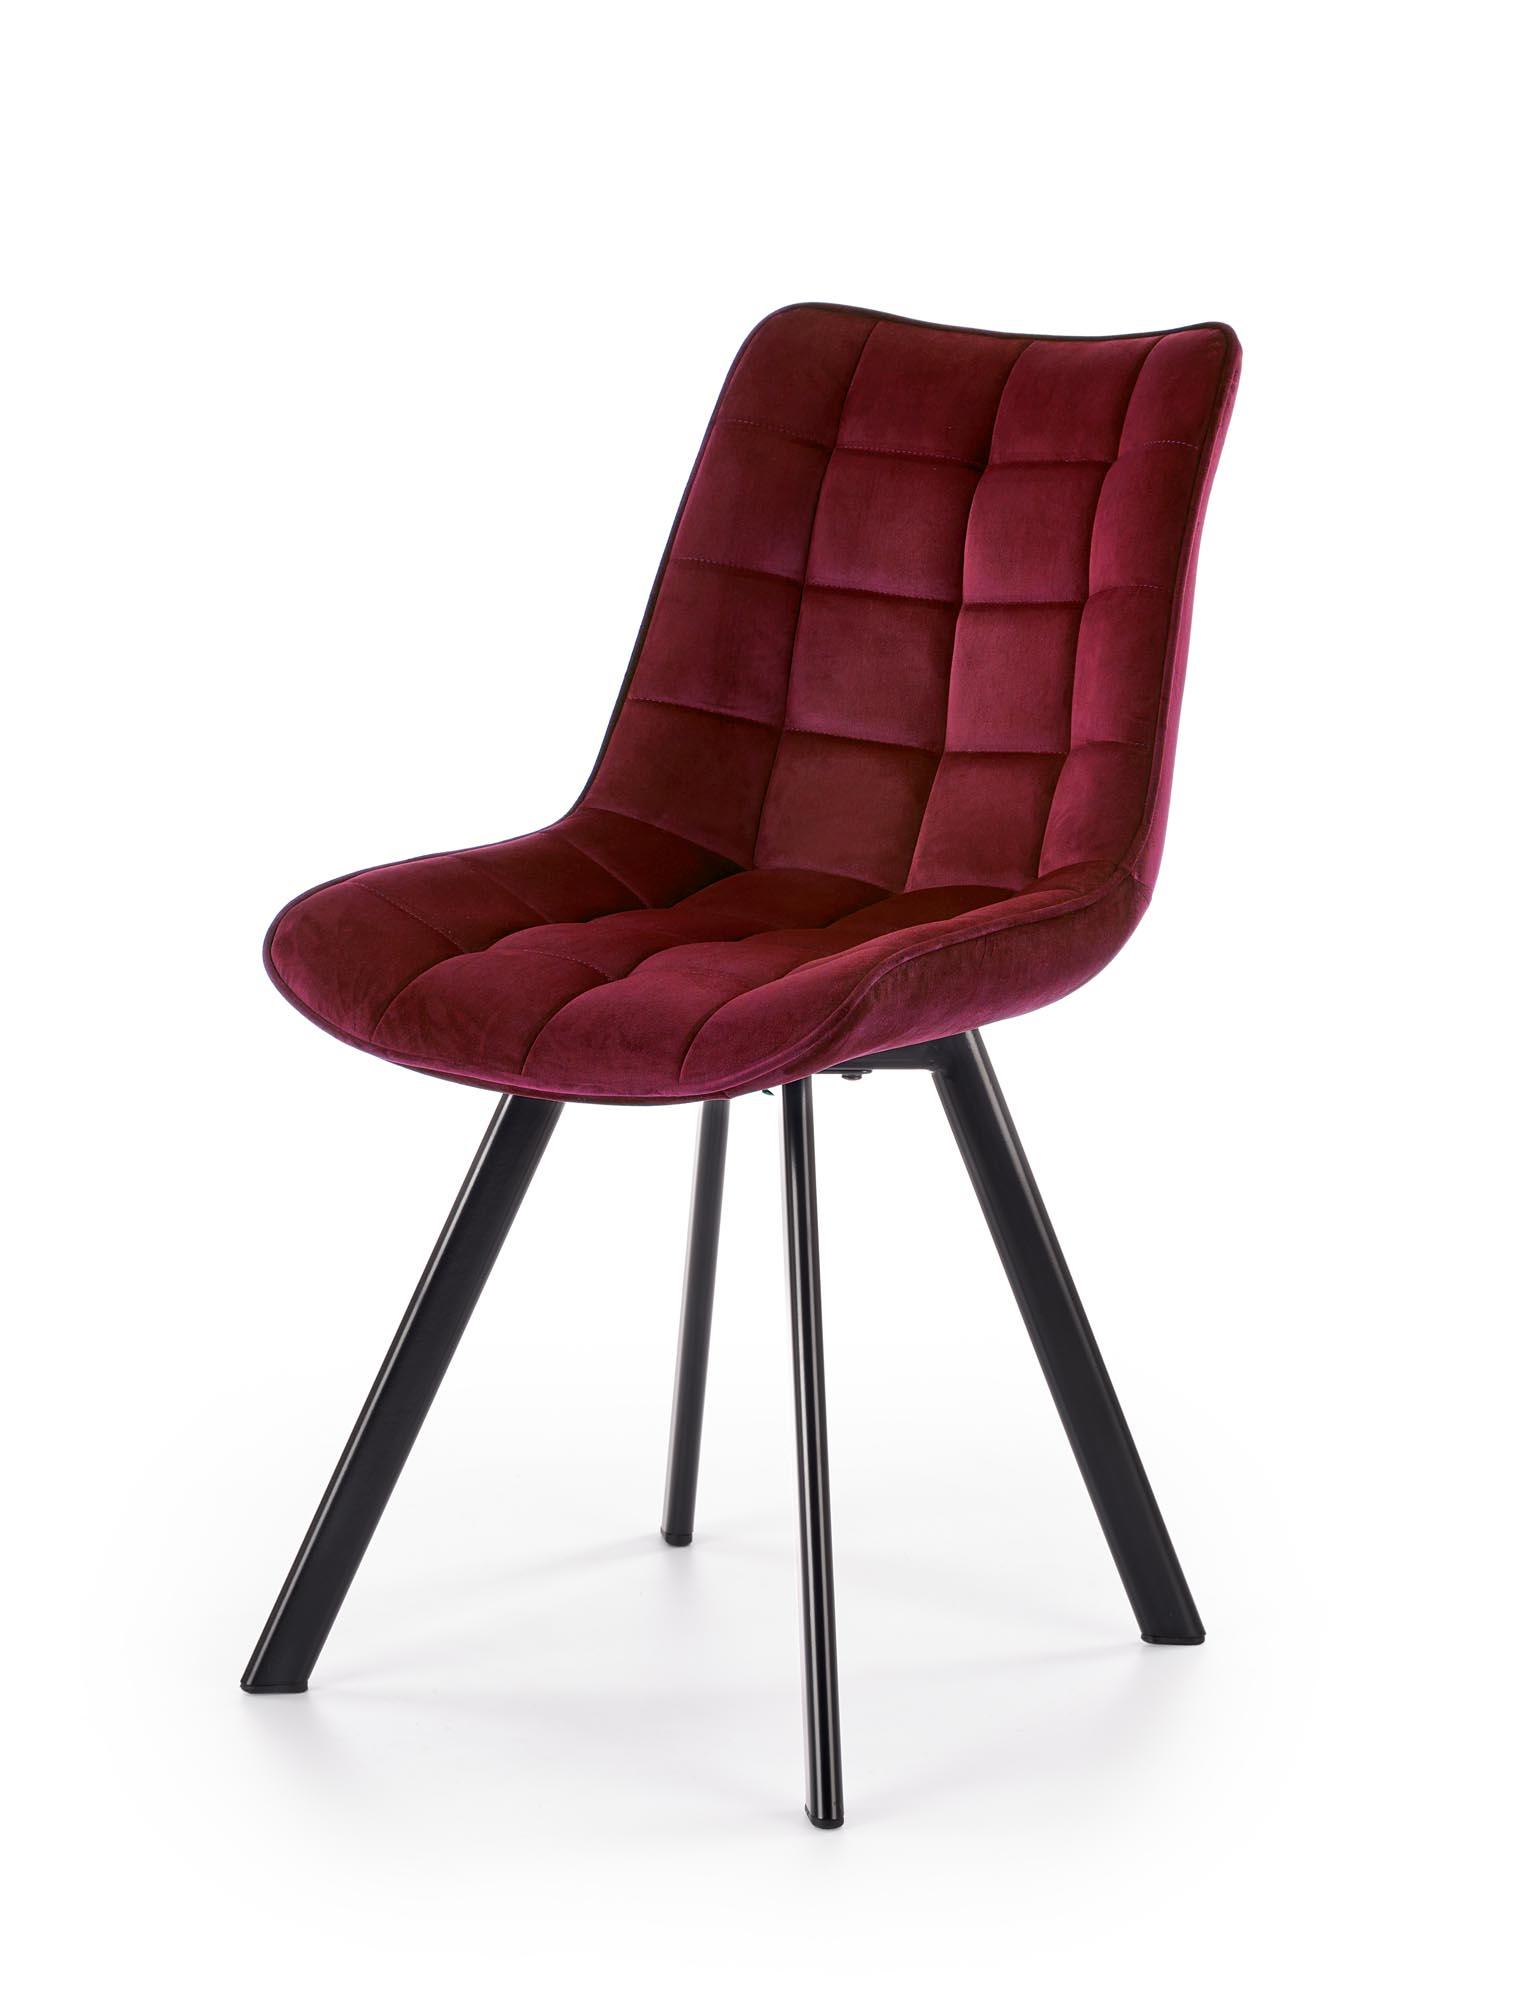 K332 stolička nohy - čierne, sedák - bordový